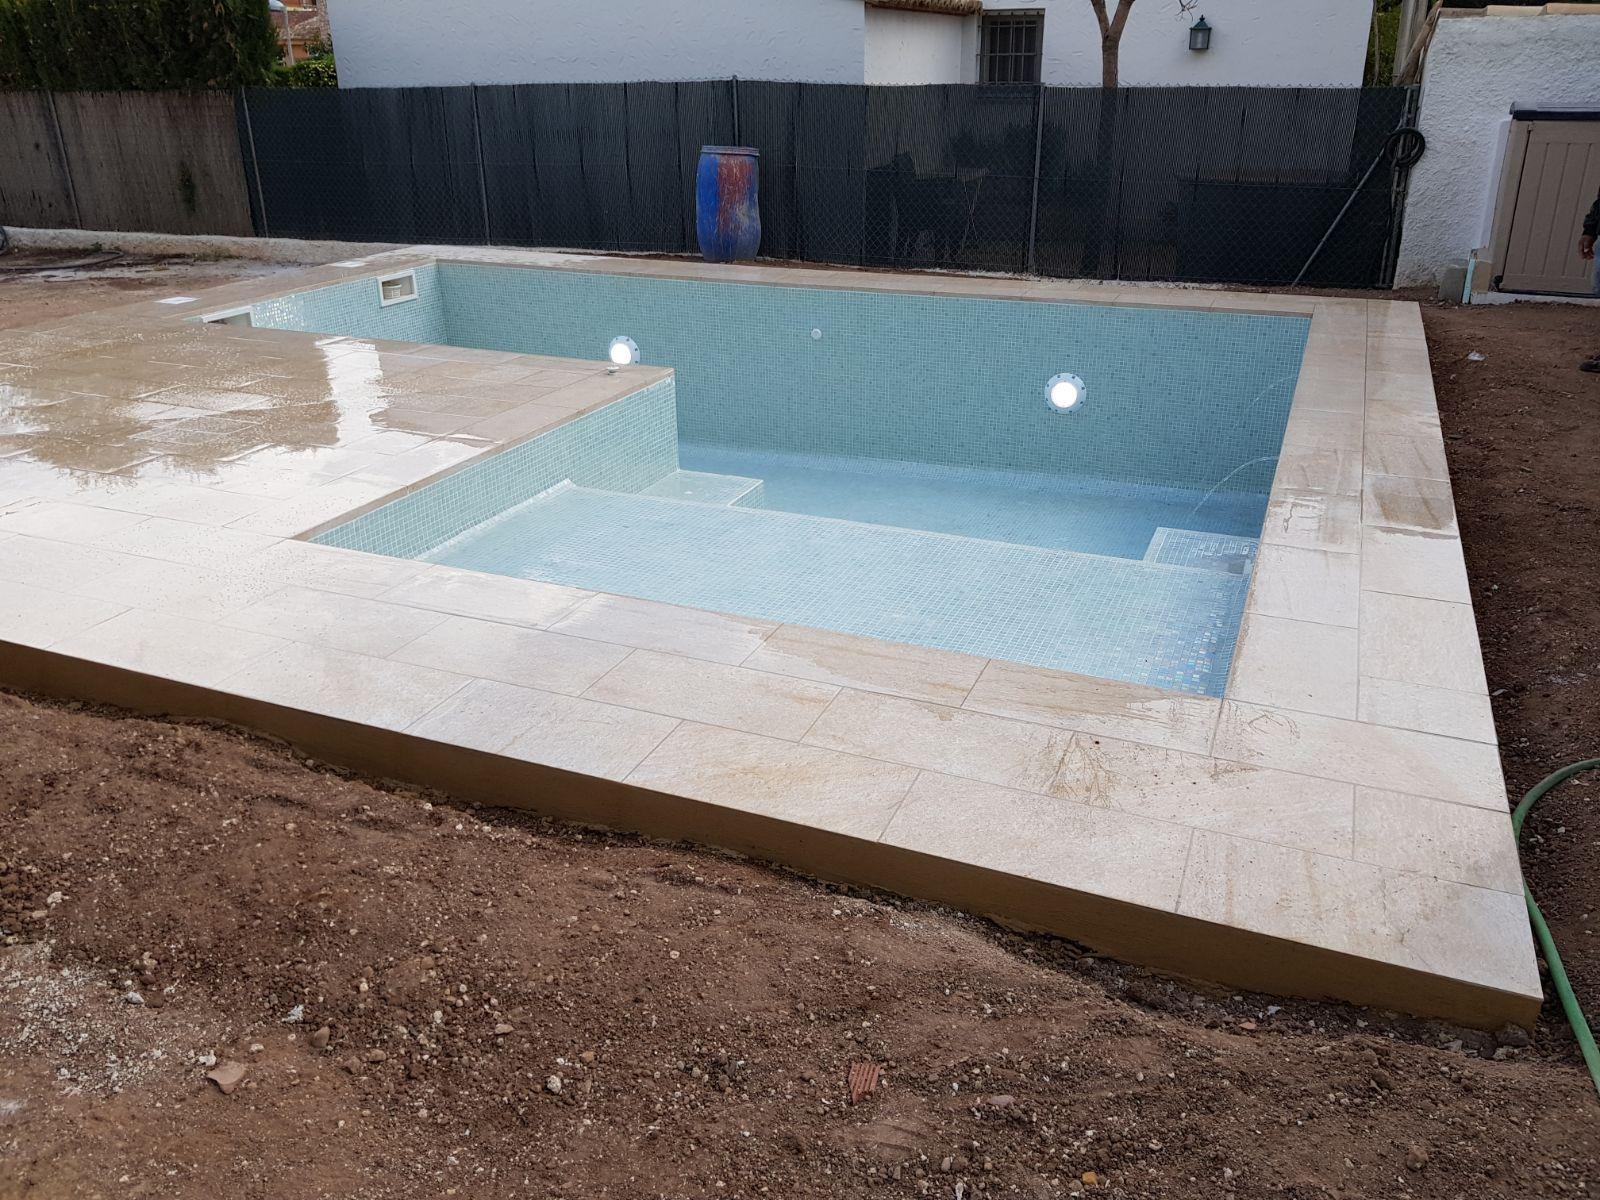 reforma_piscina_1_16